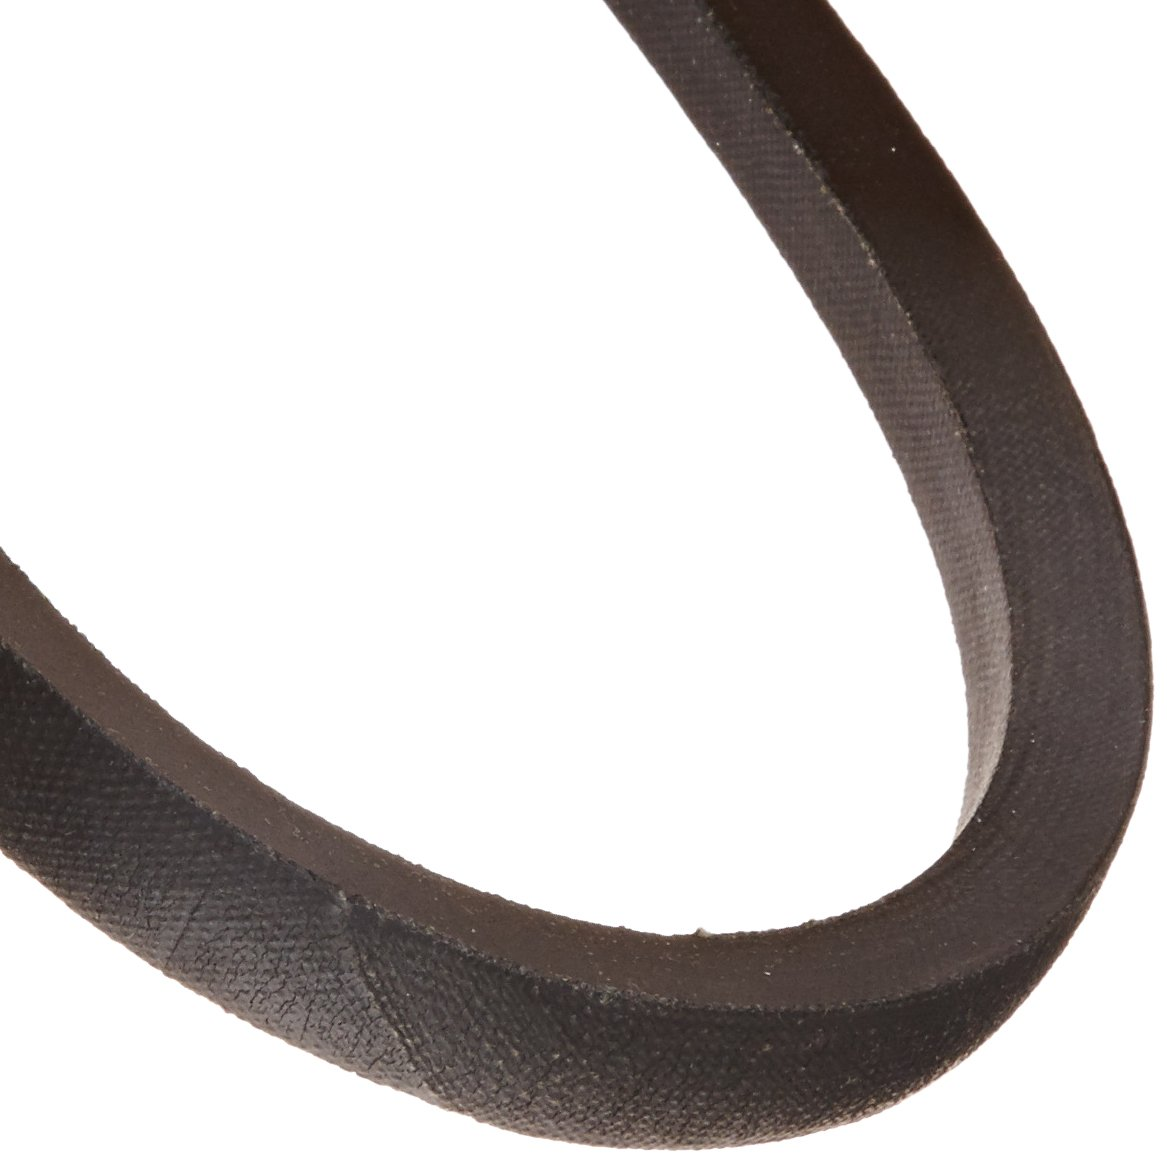 B 17mm Top Width Challenge B106 Classical V-Belt 2769mm Outside Length